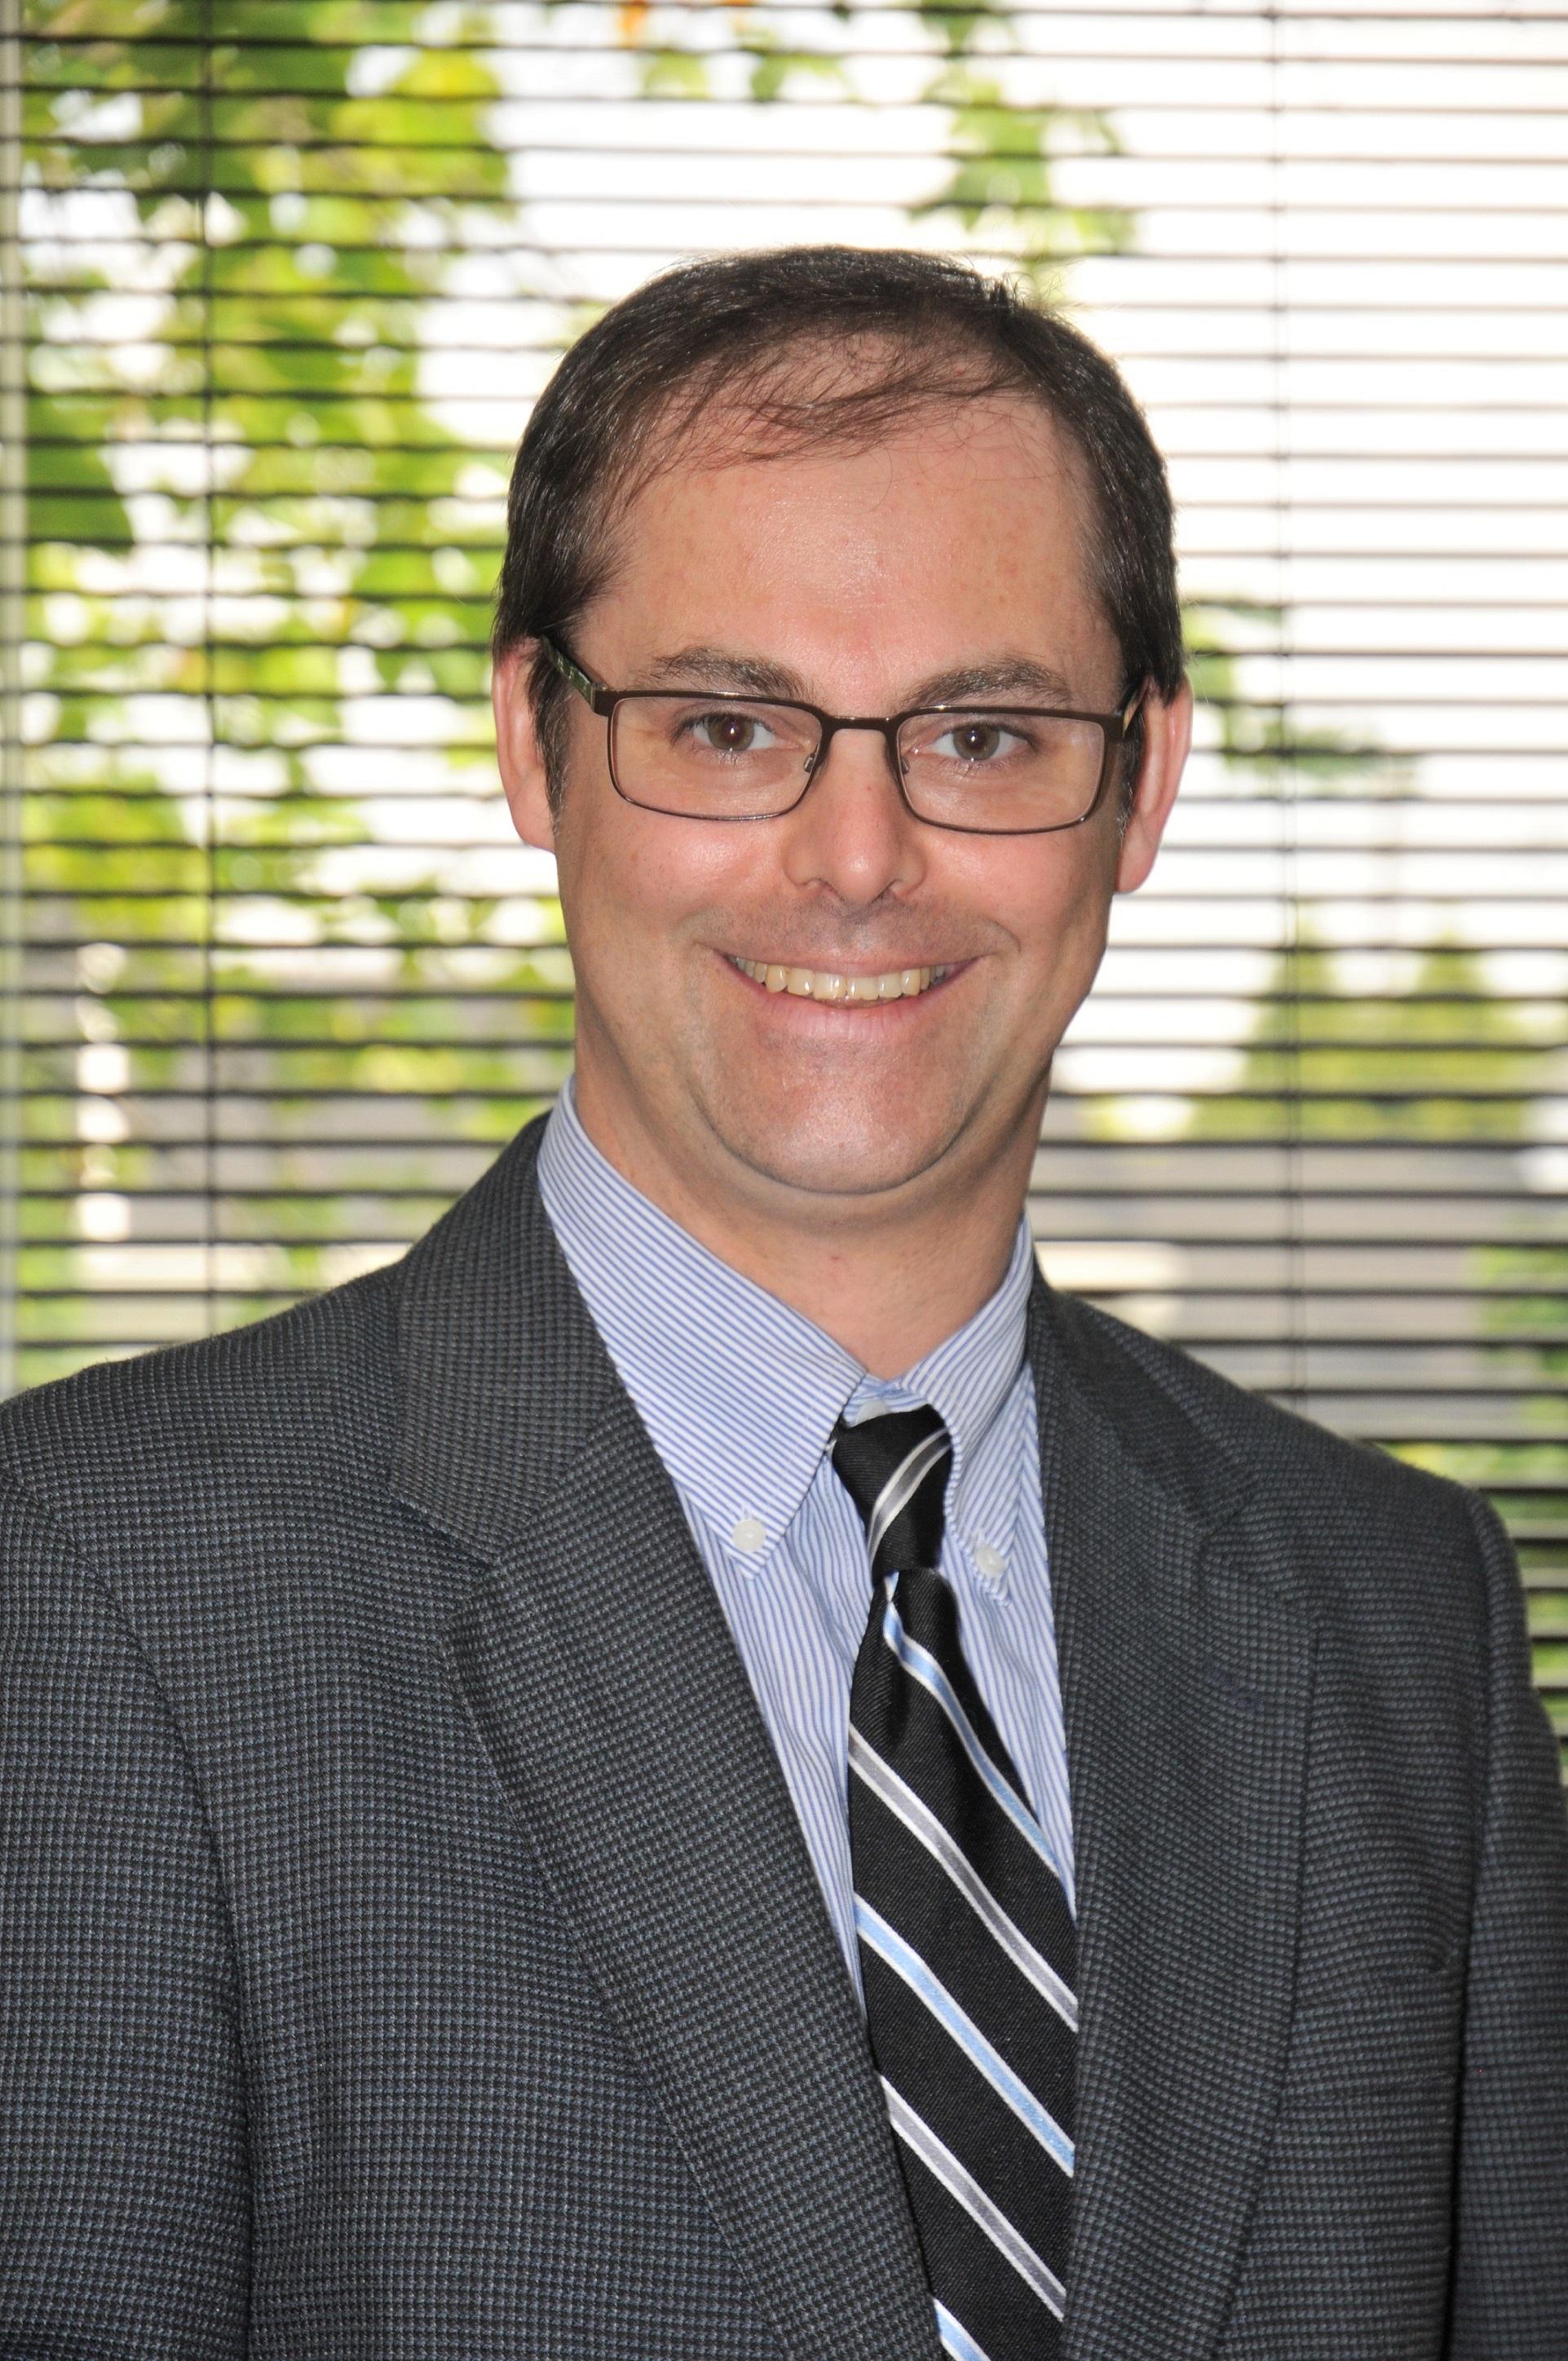 Glenn Peters, LPS, SAC, AODA, Psychotherapist